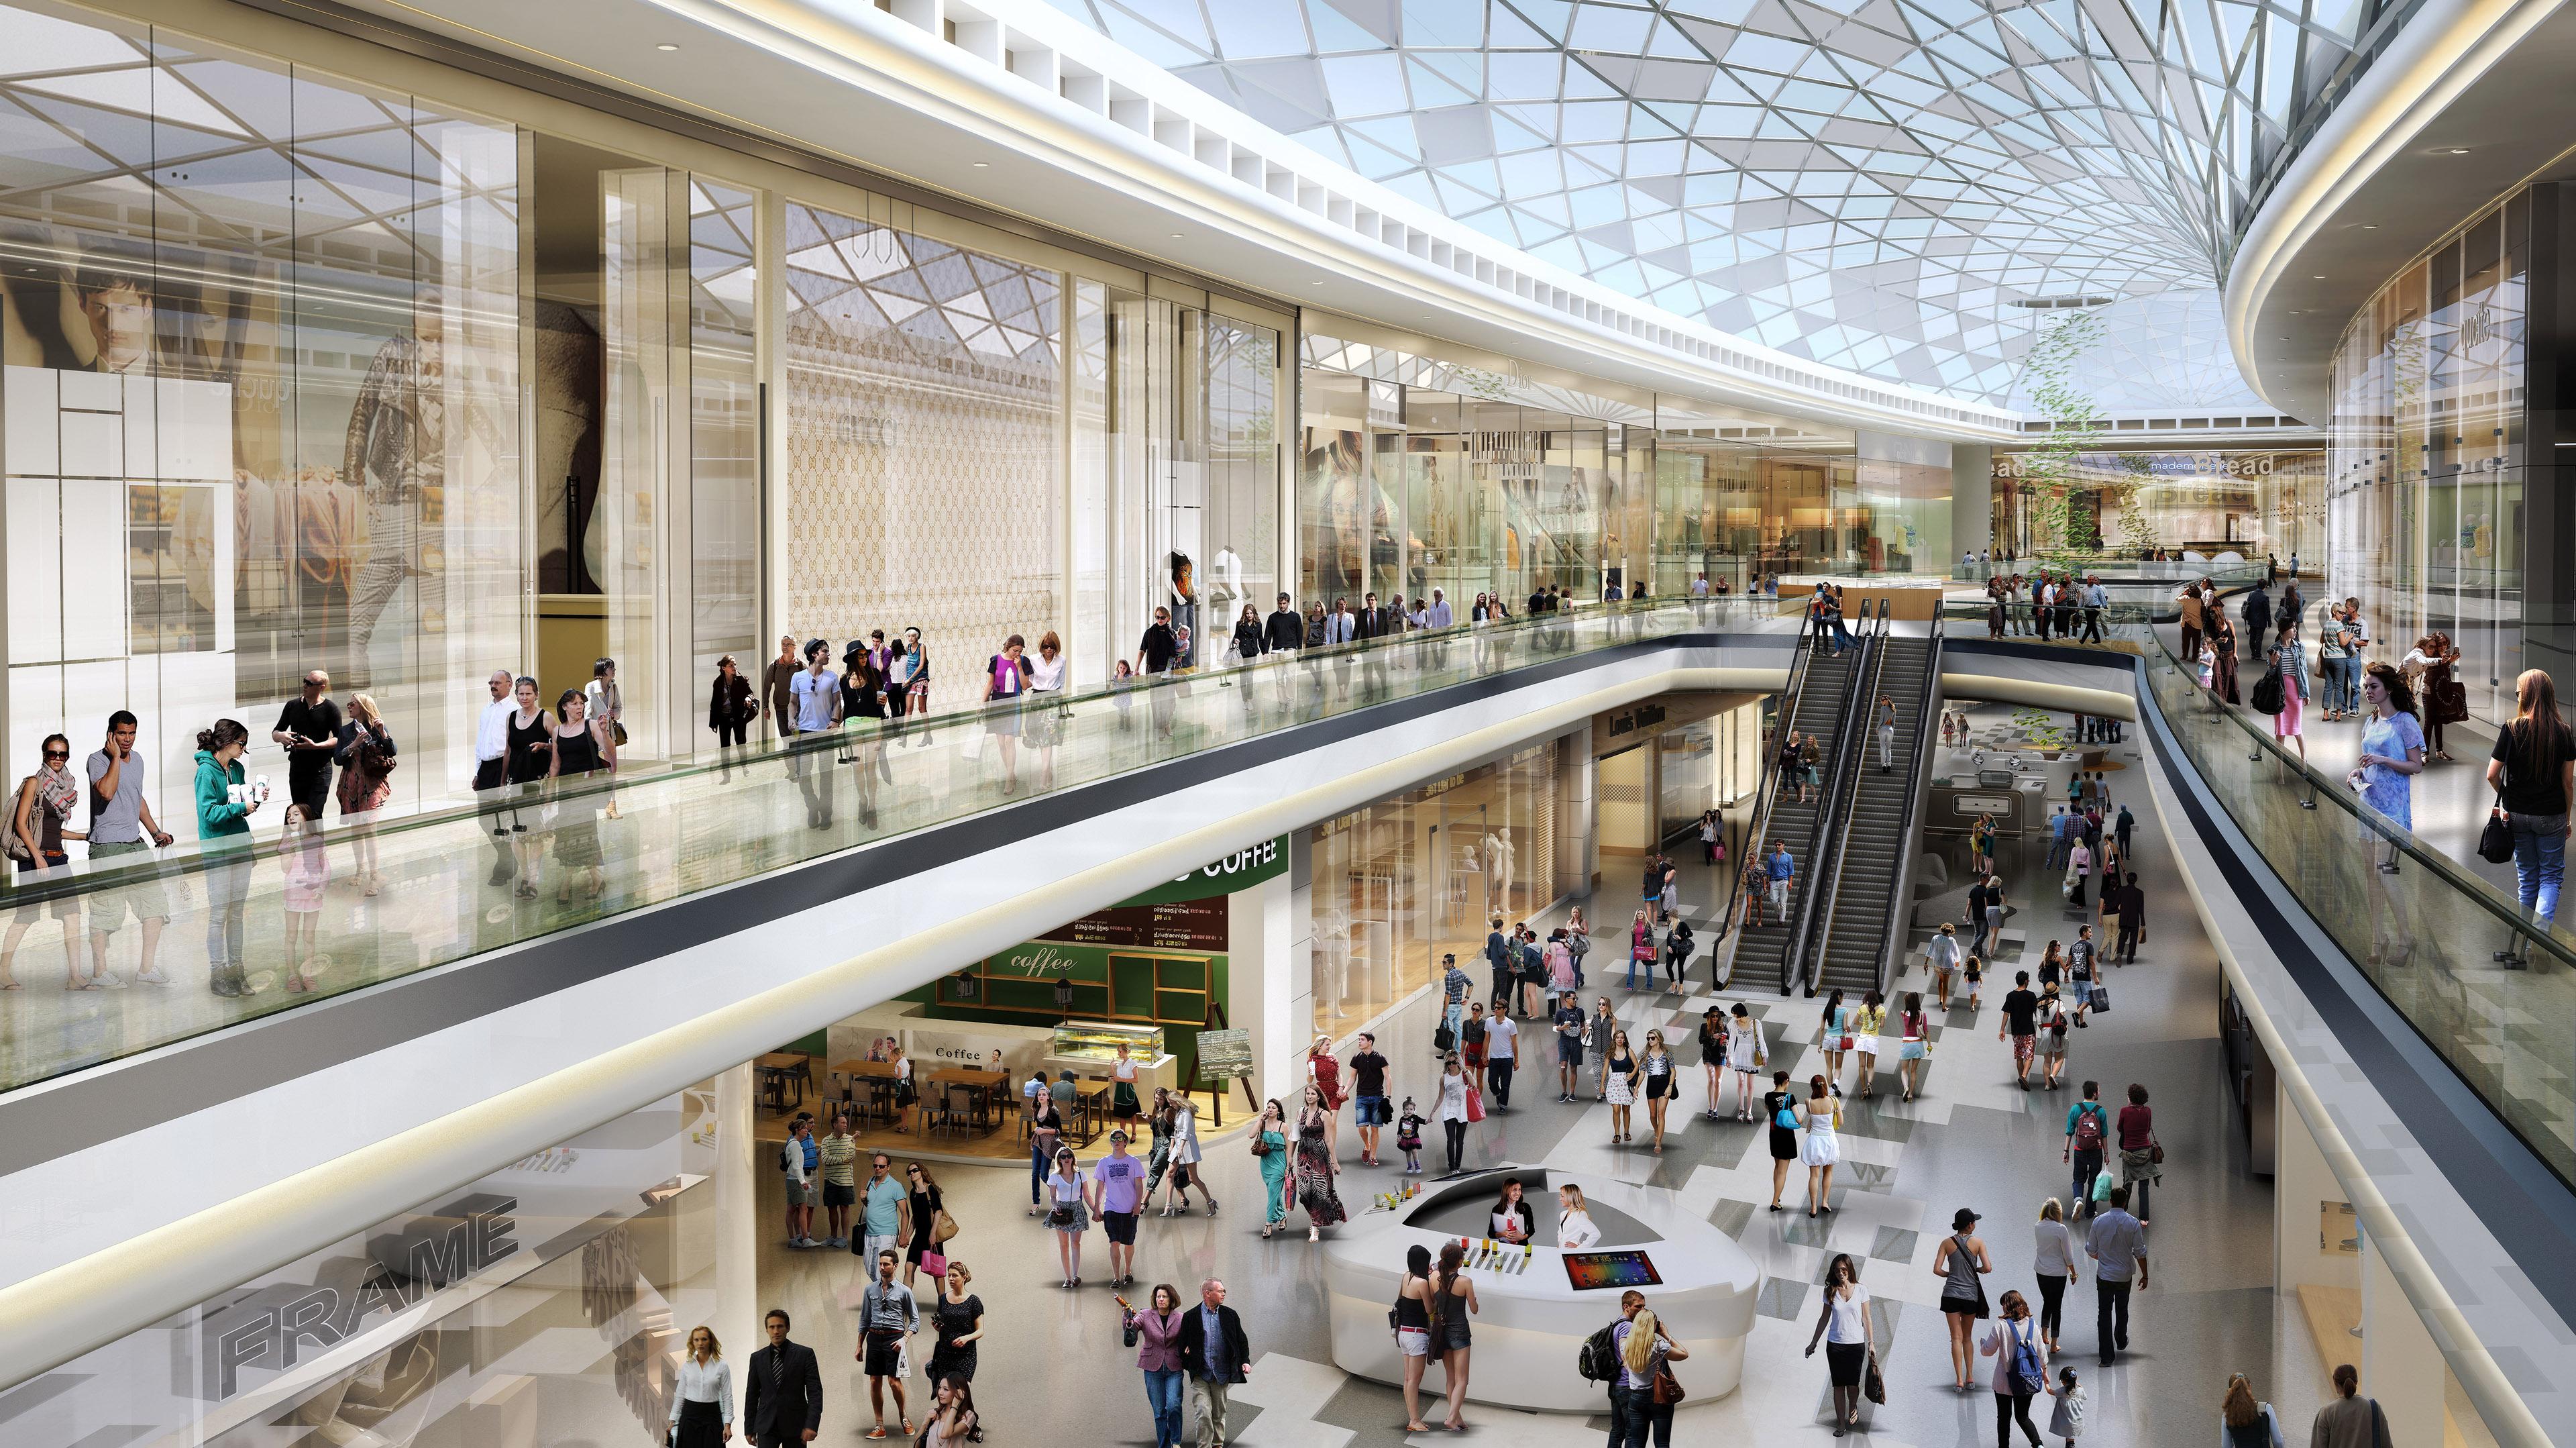 2268c8aa2 وتتمحور فكرة التصميم لهذا المشروع بوحي من مراكز التسوق الشهيرة الموجودة في  لندن والتي أنشأتها شركة ويستفيلد الأسترالية العملاقة. ولقد سعت مجموعة  الرائد إلى ...